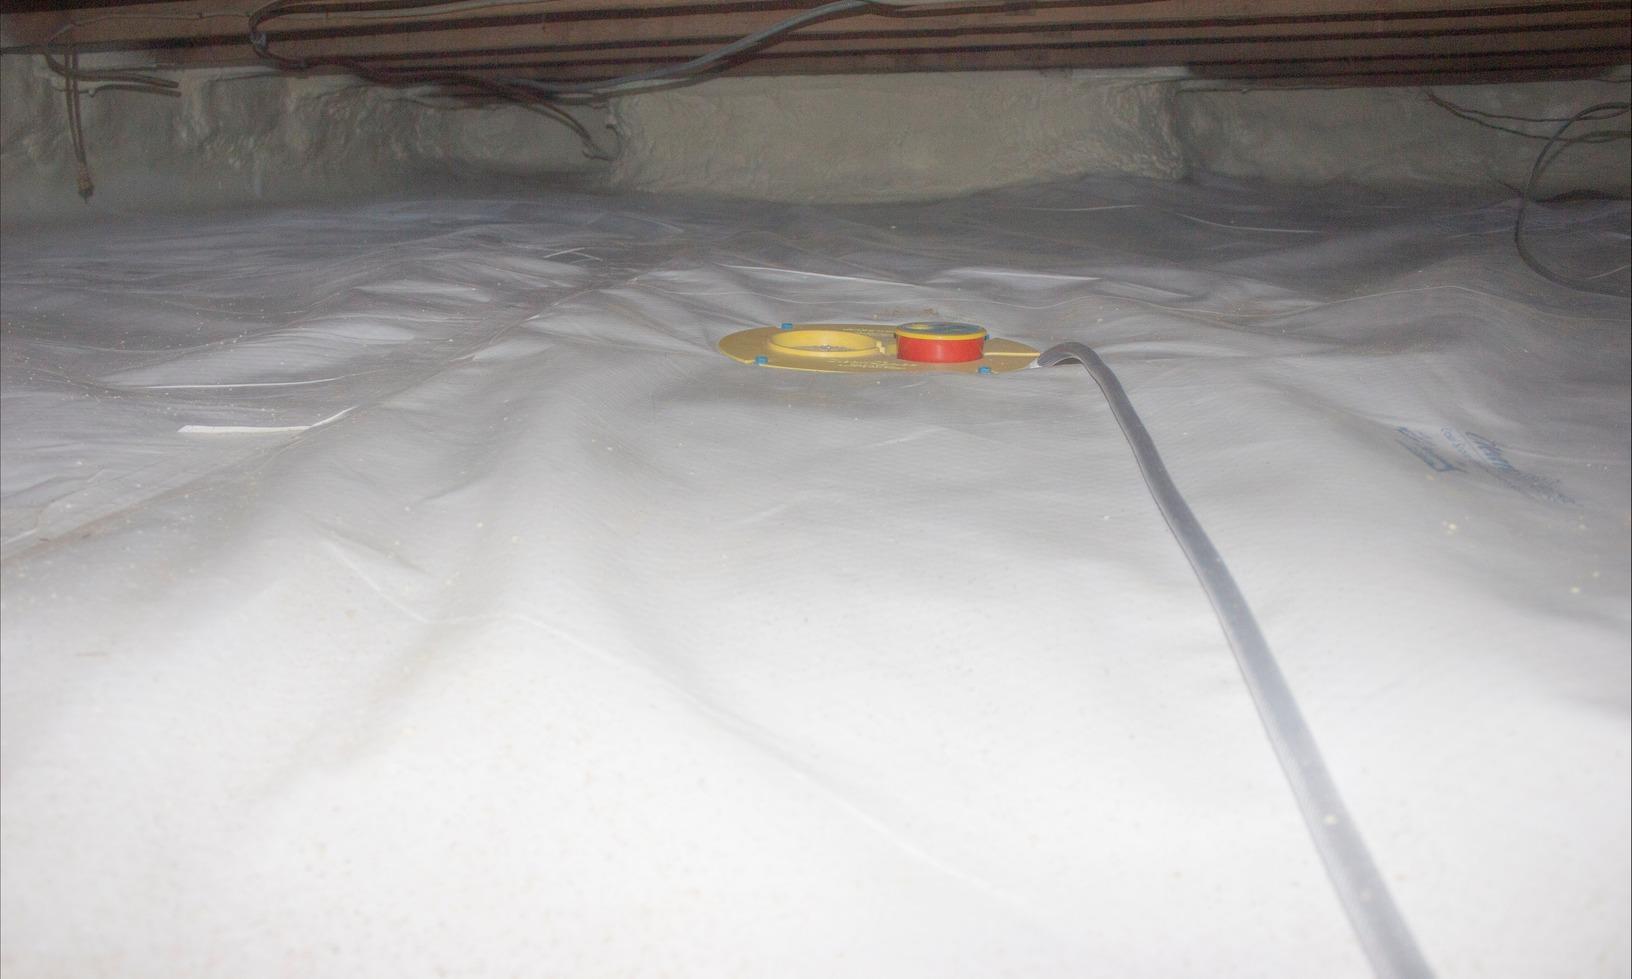 Crawlspace Encapsulation and Weatherizing in Claremont, New Hampshire. - After Photo